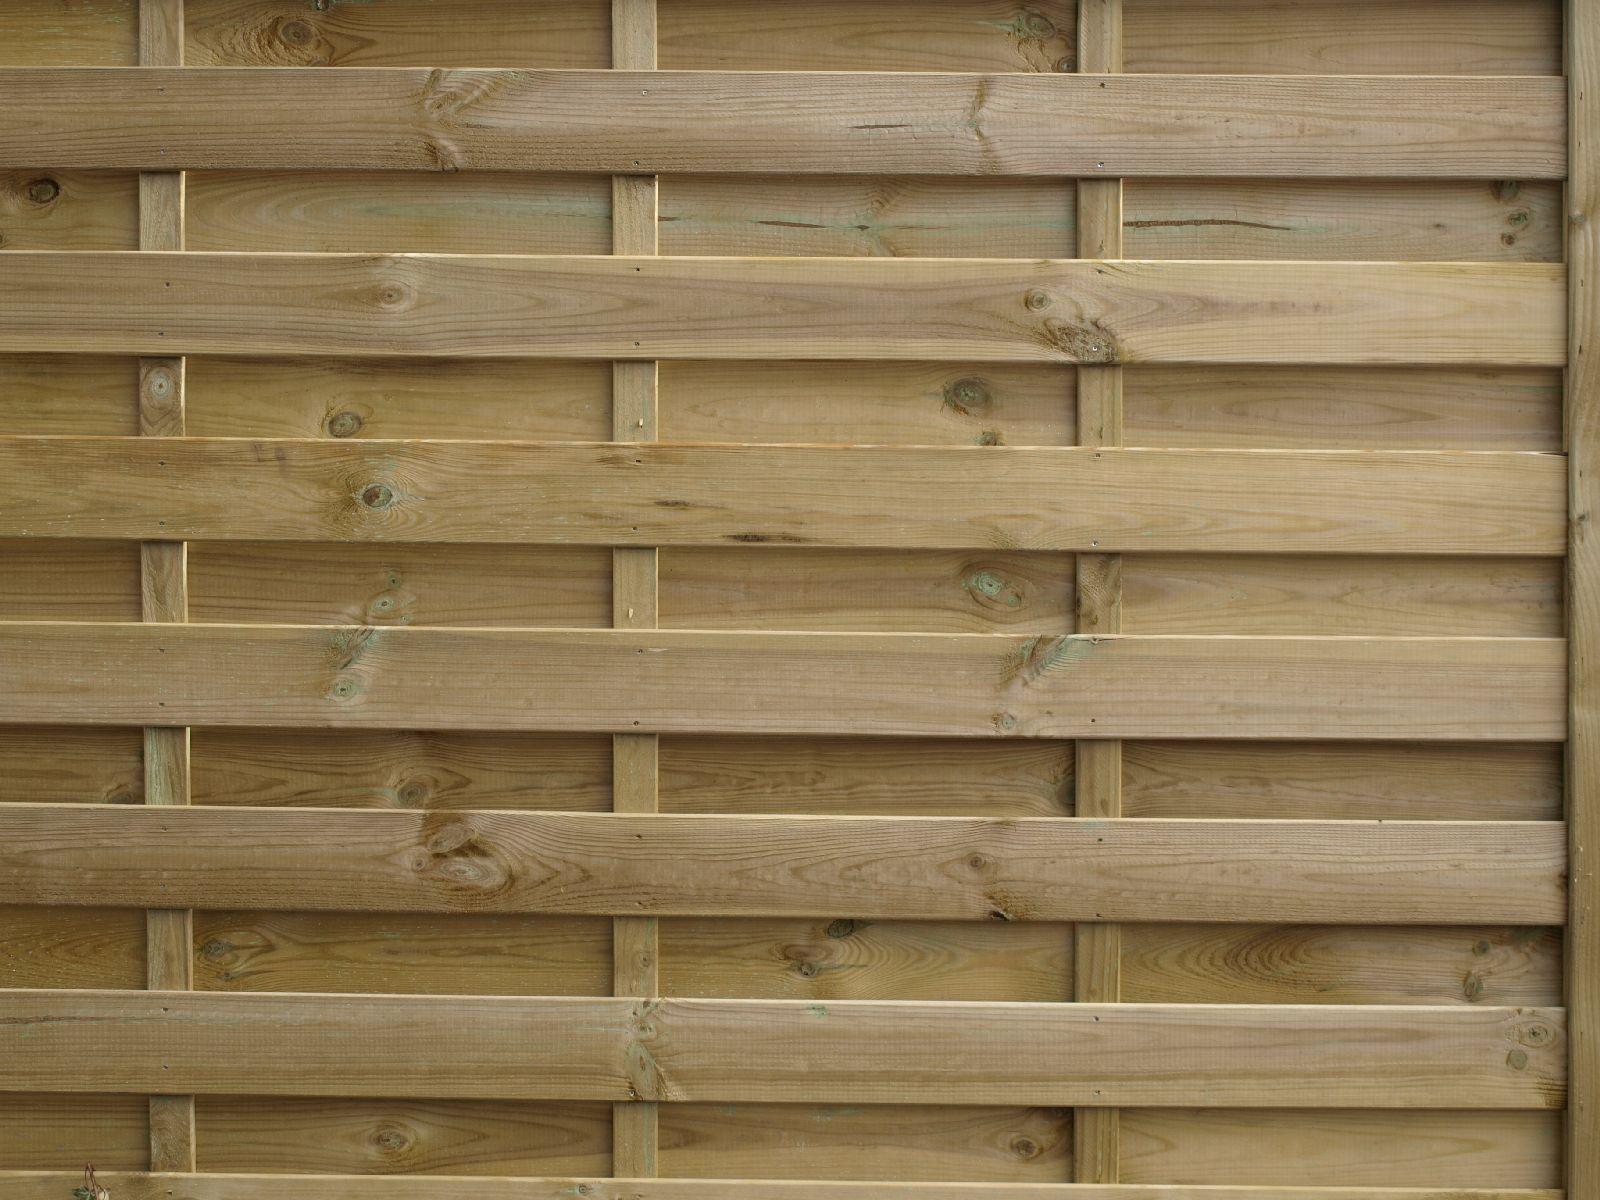 Wood_Texture_A_P5022111